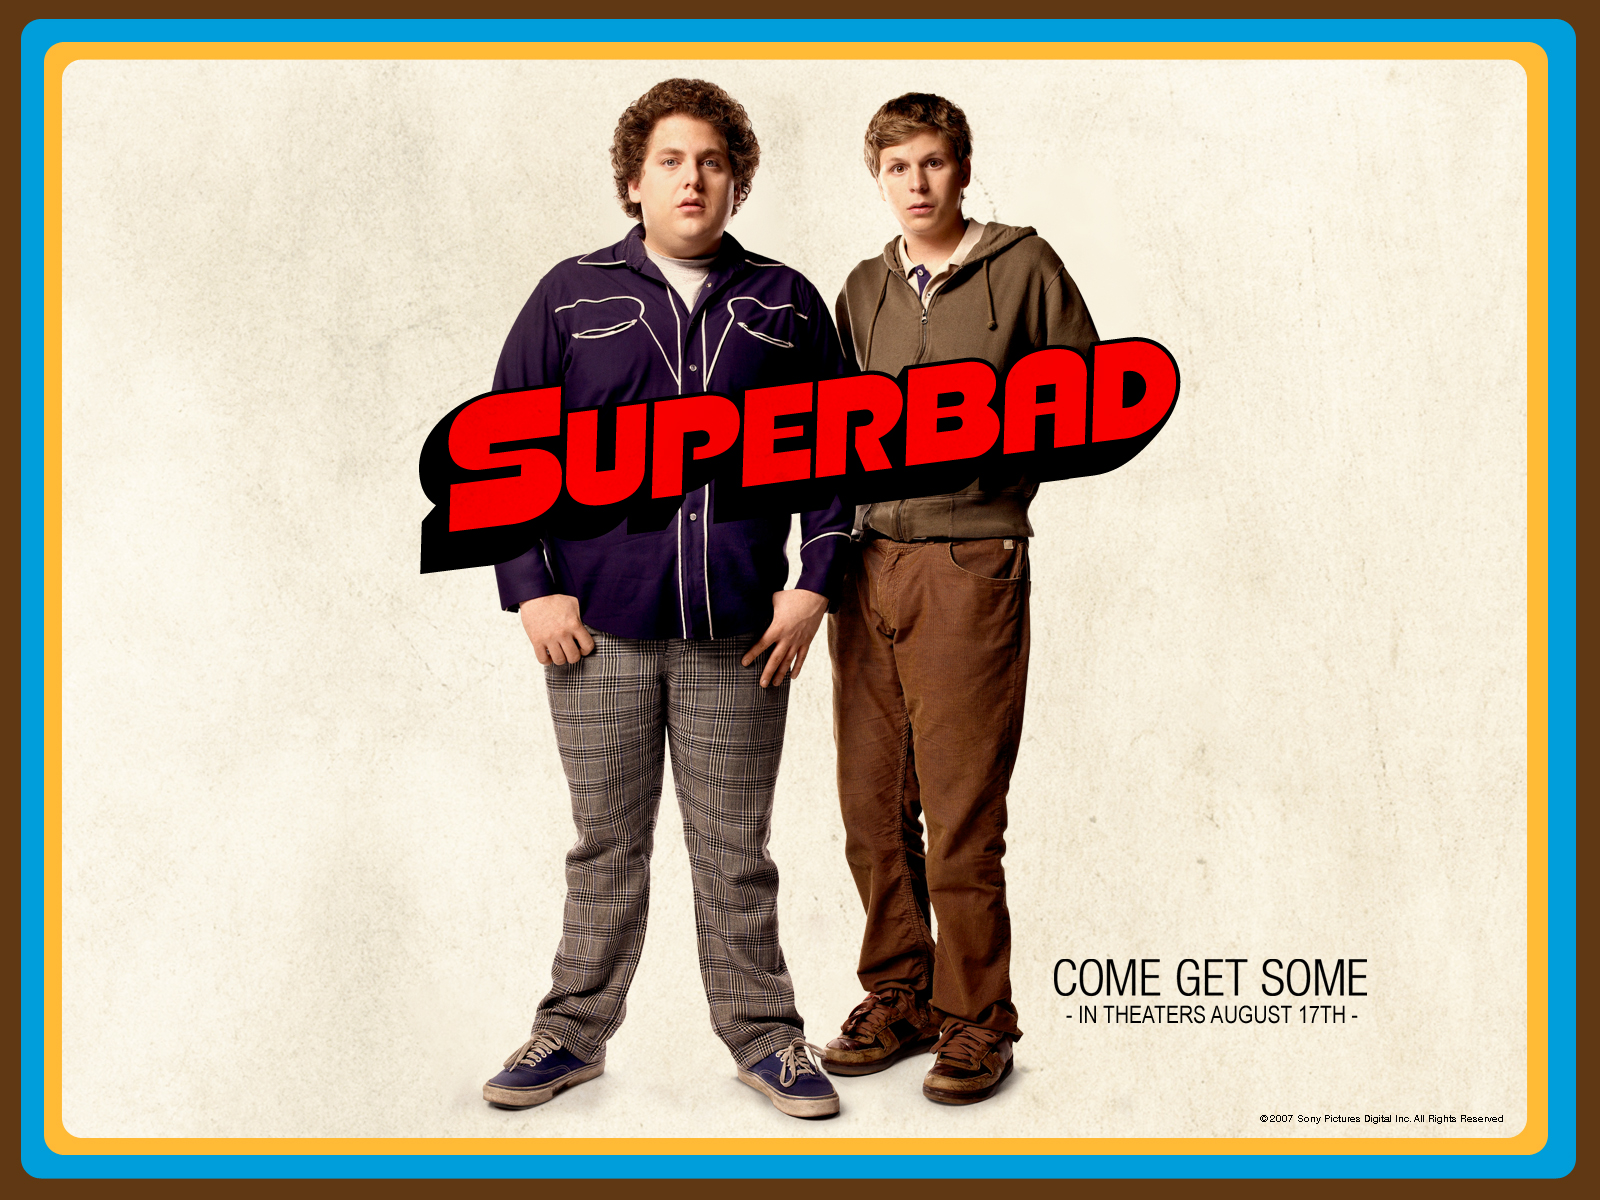 Superbad-Wallpaper-michael-cera-387330_1600_1200